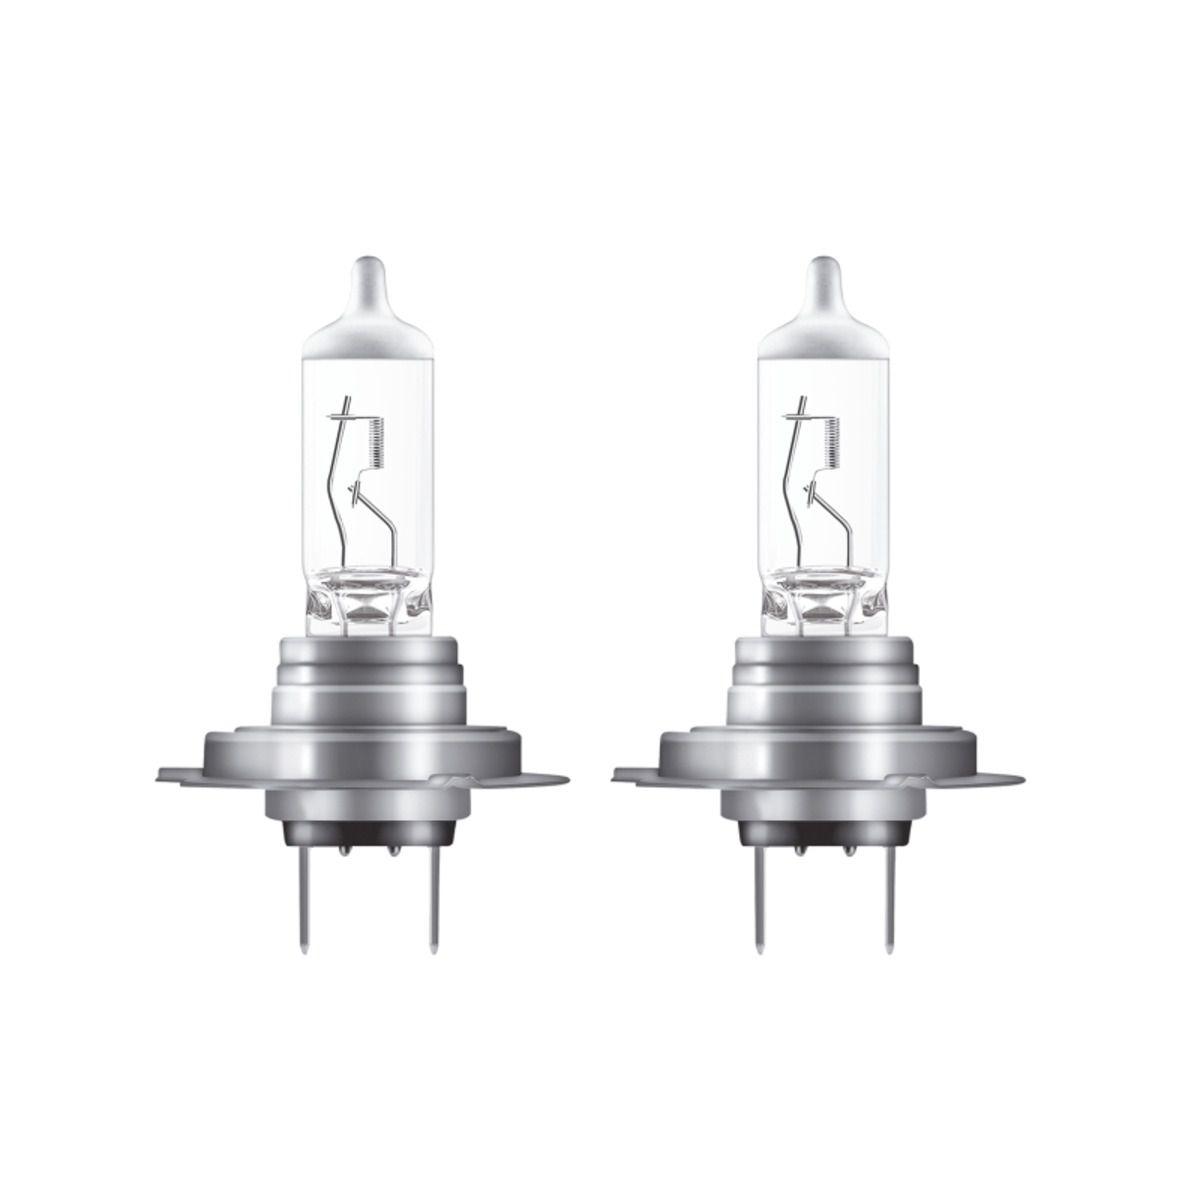 Lampada Farol Osram Night Breaker Silver H7 100% + Luz  - Rea Comércio - Sua Loja Completa!